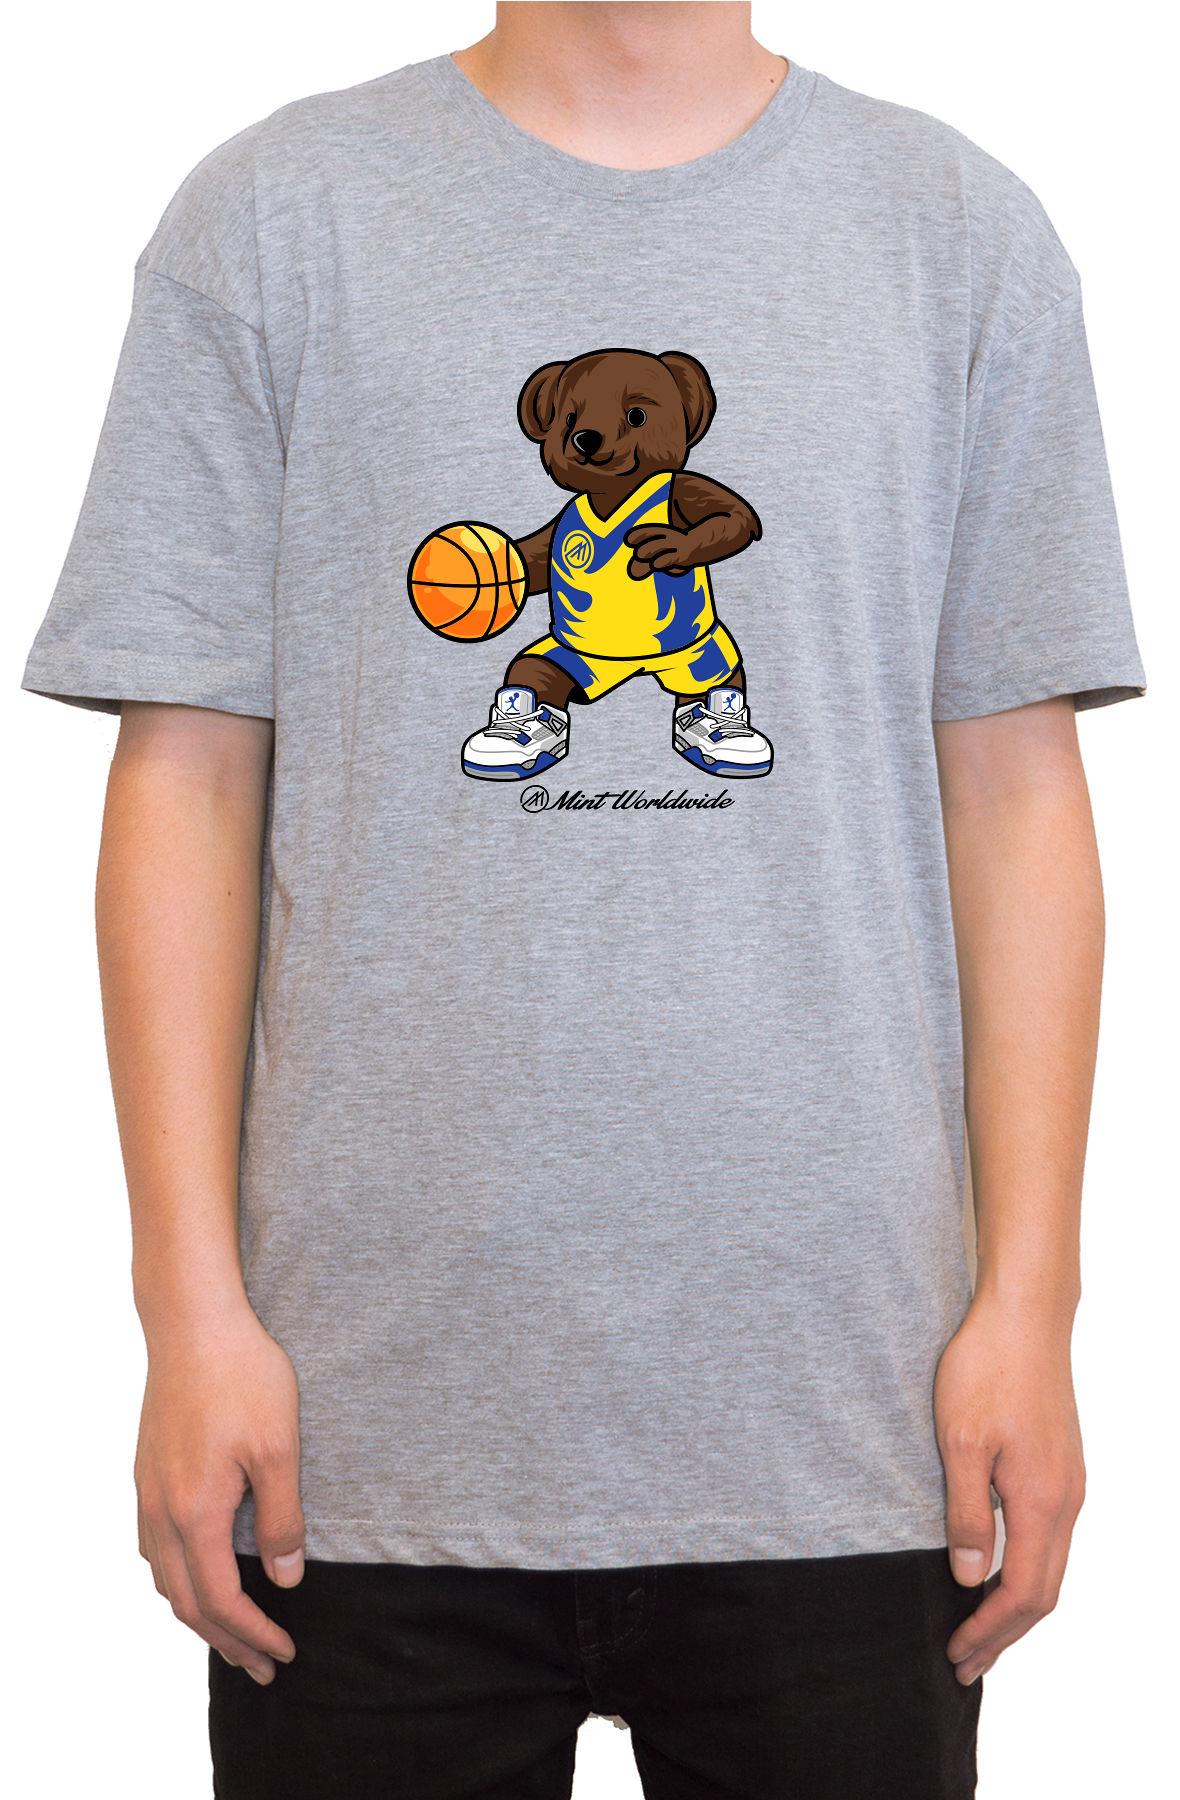 """BasketBall Bear T-shirt """" Heather Gray"""